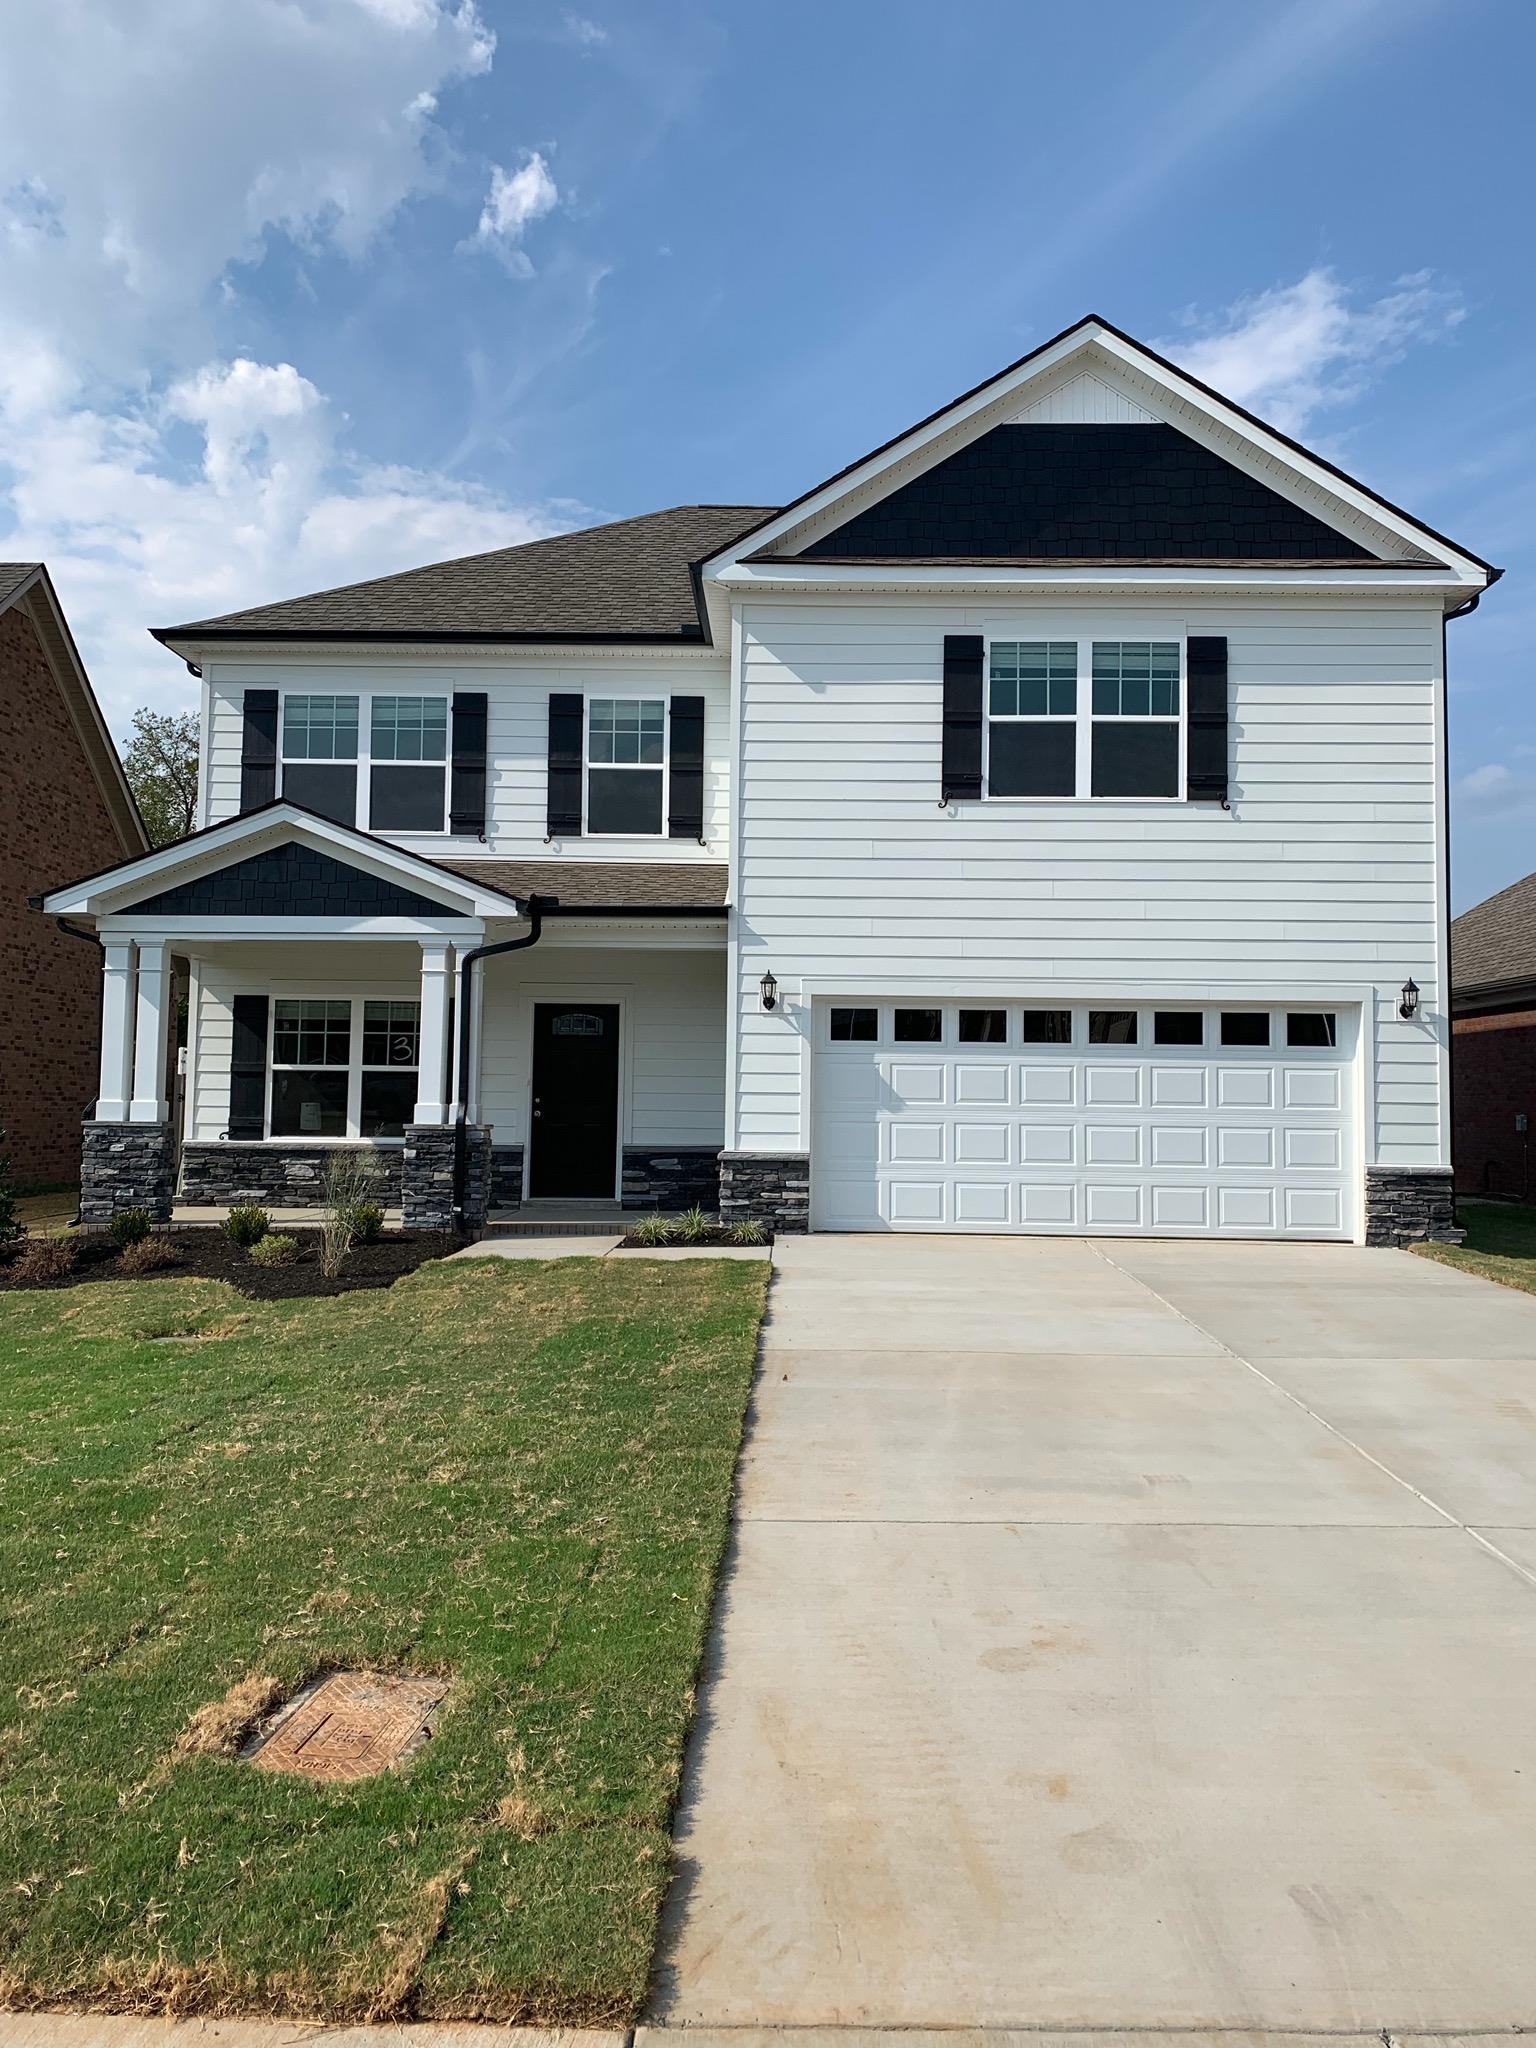 3438 Pear Blossom Way / LT.37, Murfreesboro, TN 37127 - Murfreesboro, TN real estate listing